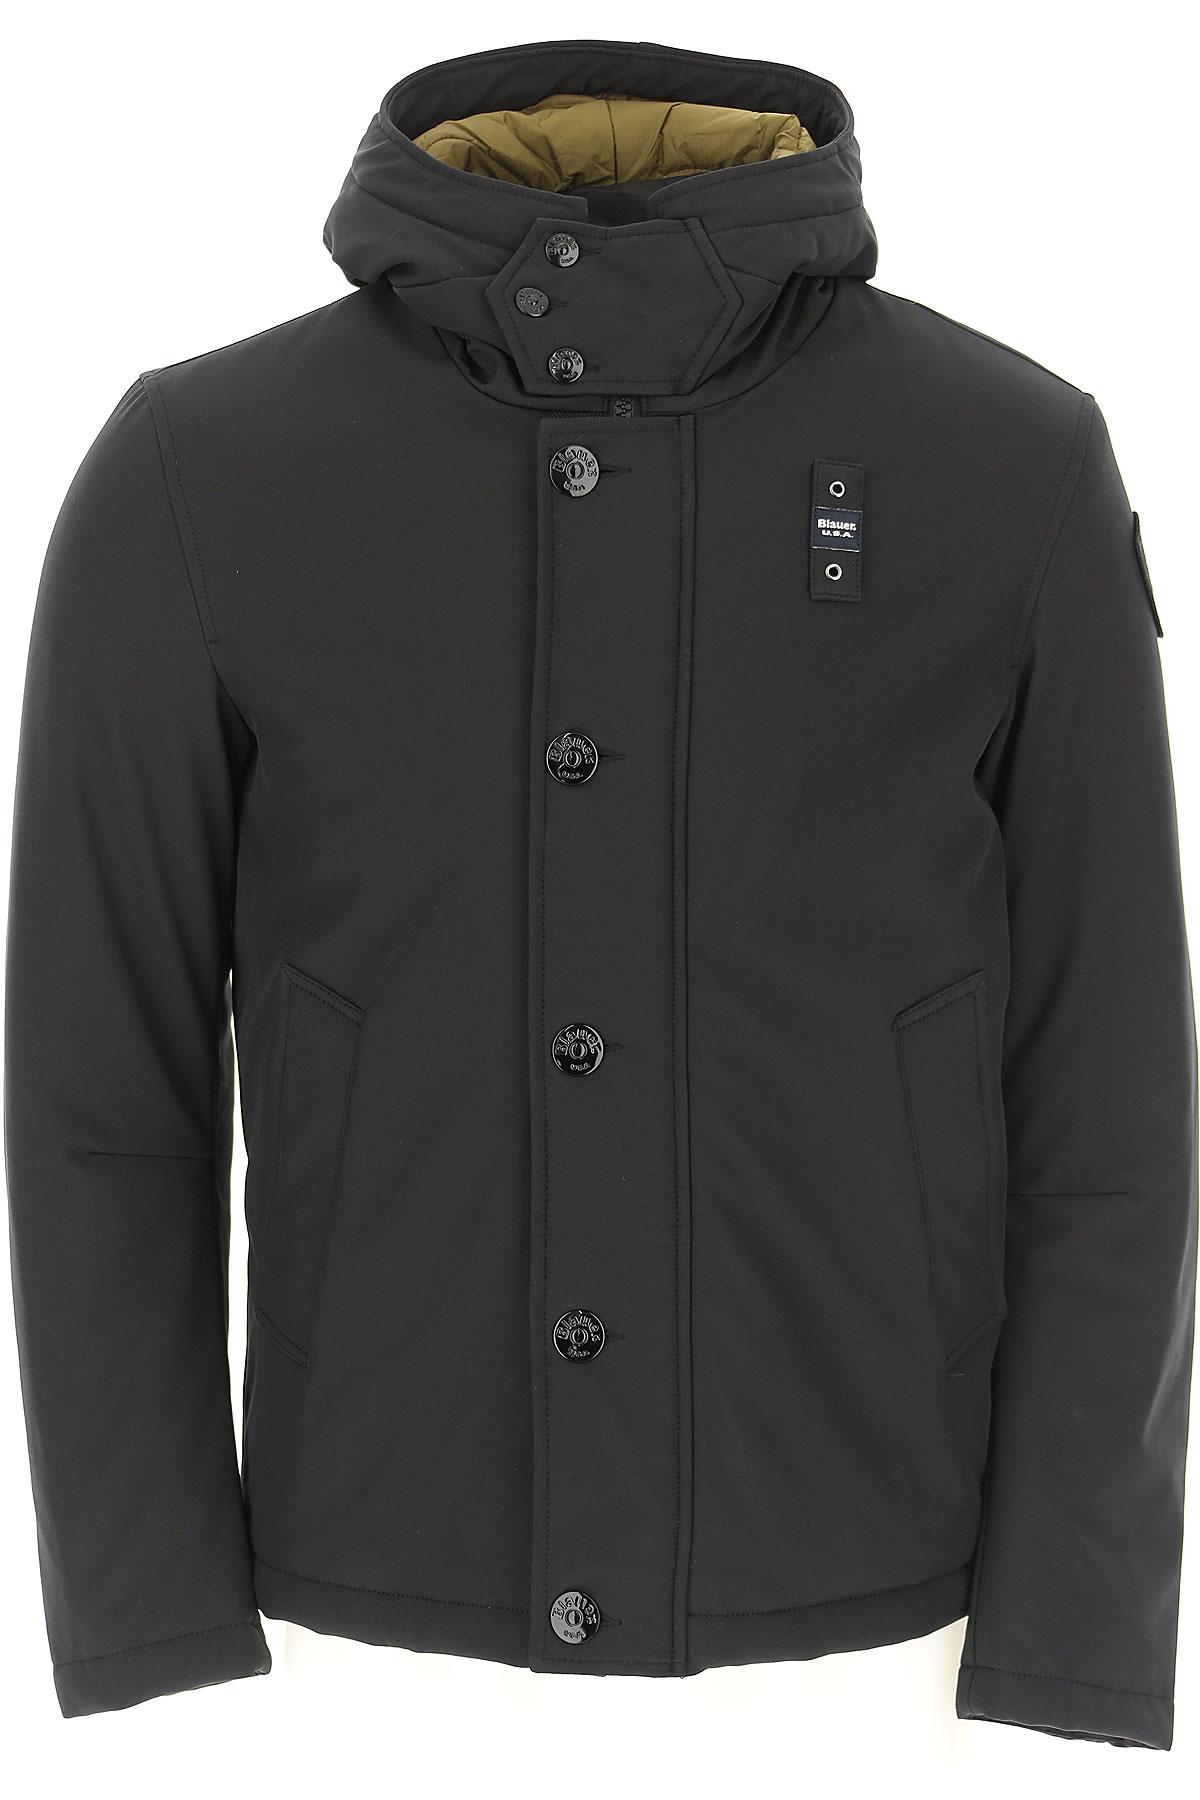 Blauer Down Jacket for Men, Puffer Ski Jacket On Sale, Black, polyester, 2019, M S XL XXL